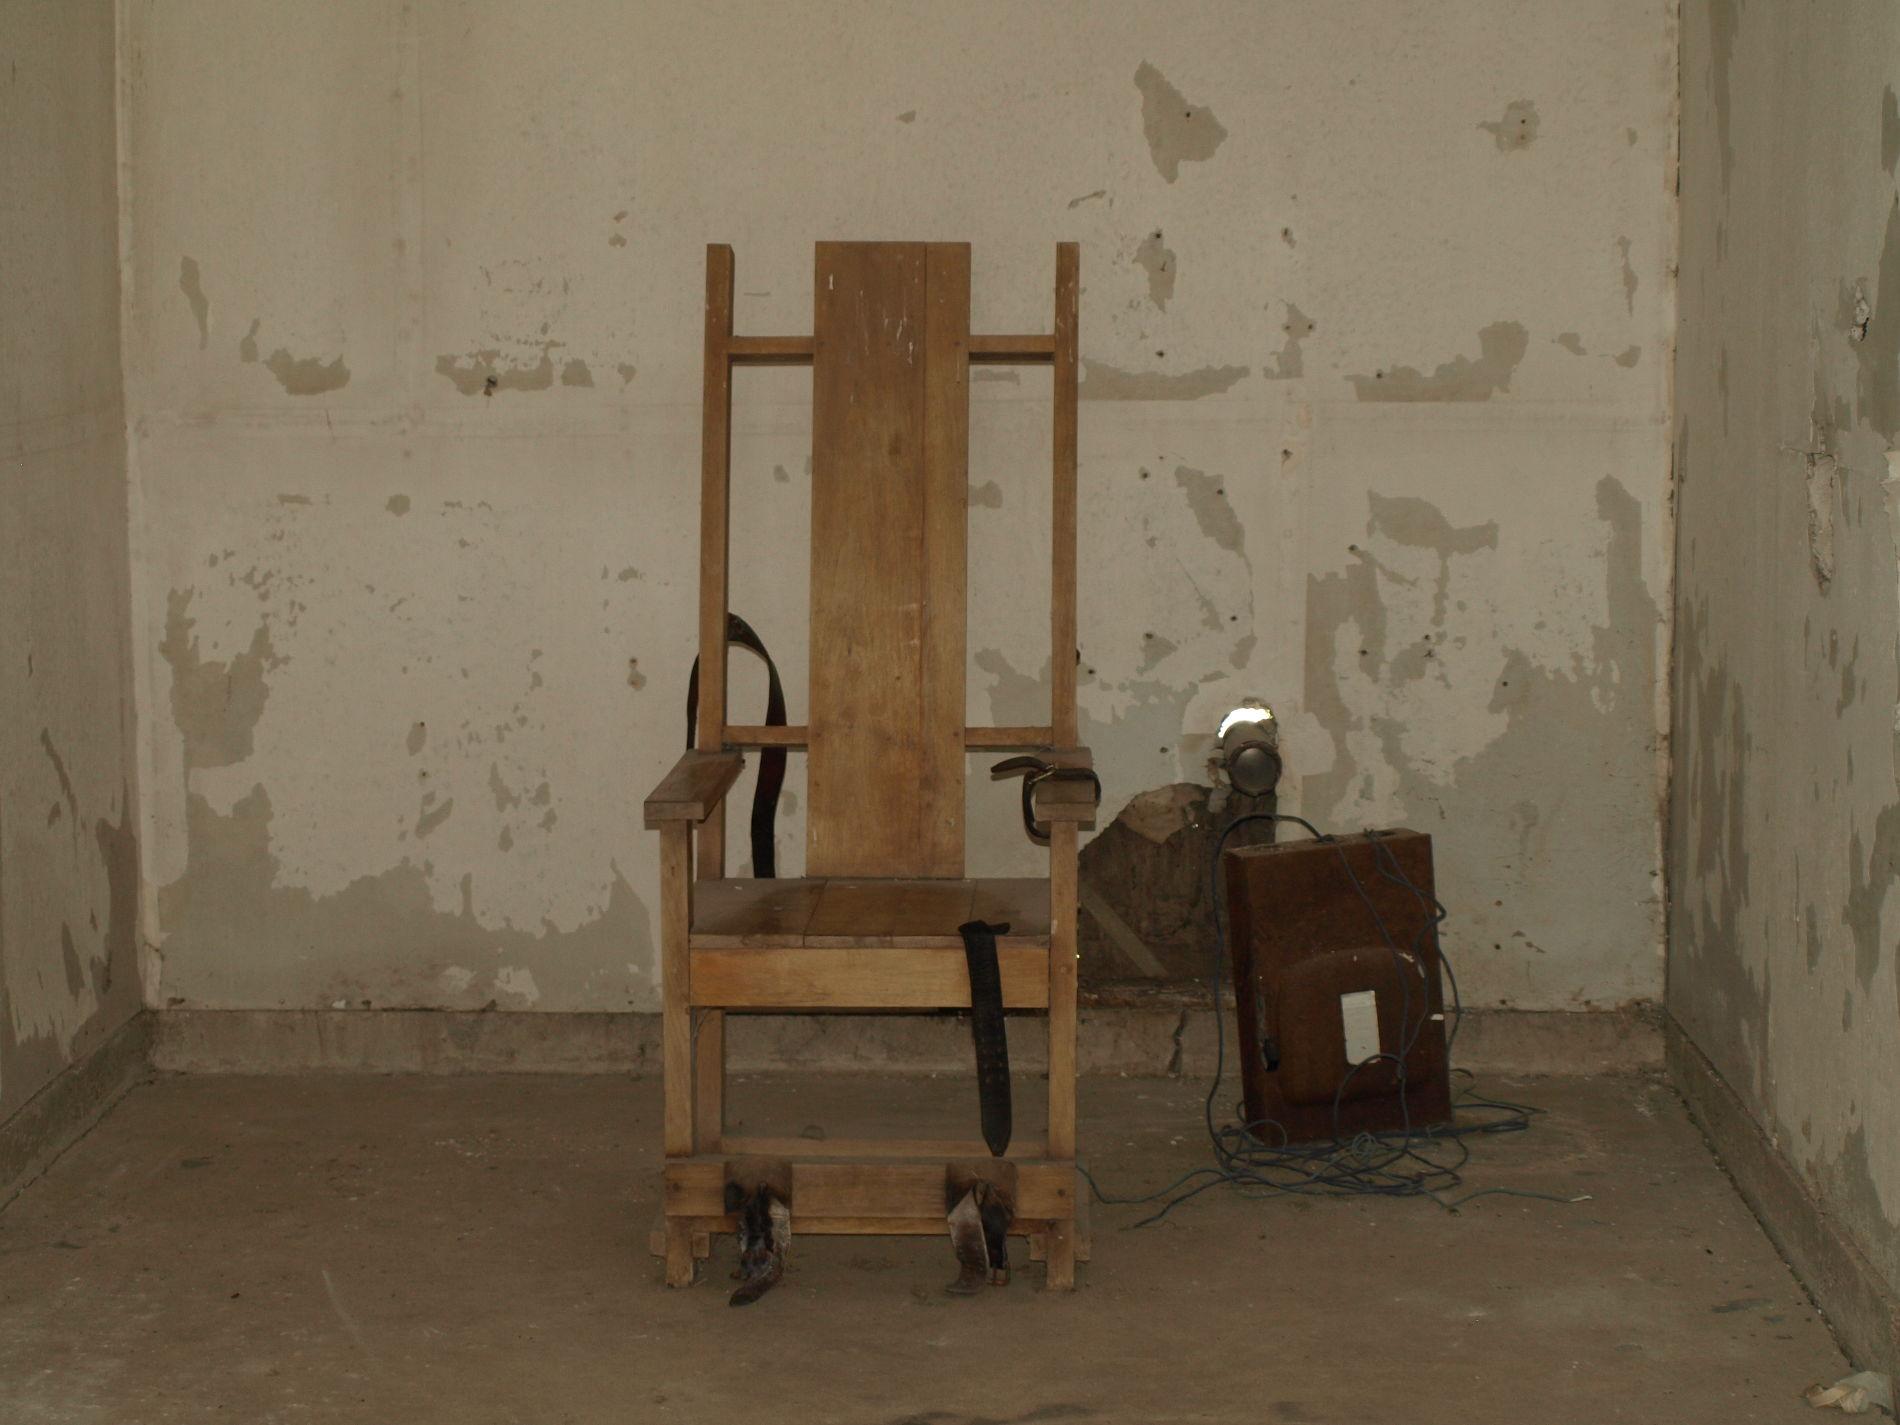 Бывшая комната для экзекуций в тюрьме штата Луизиана ©Фото с сайта wikimedia.org